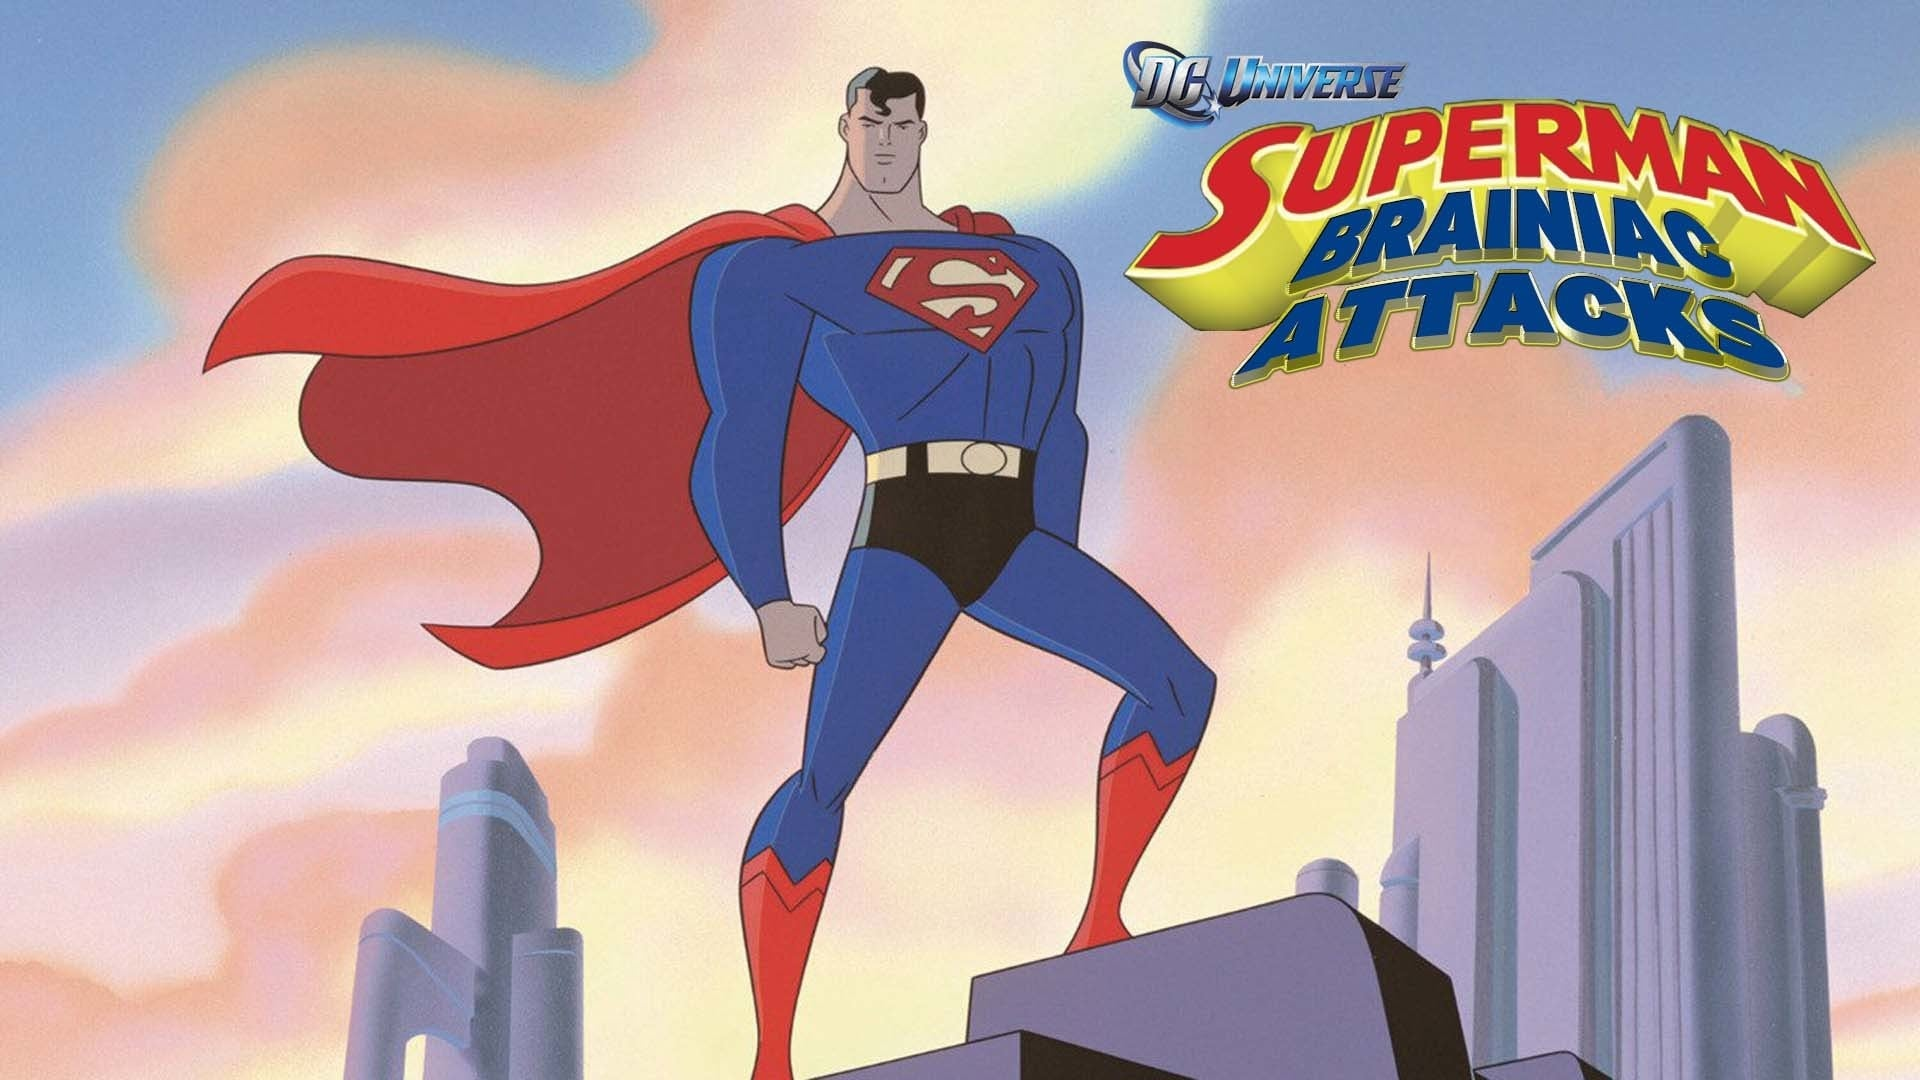 Regarder Superman: Brainiac Attacks en streaming gratuit